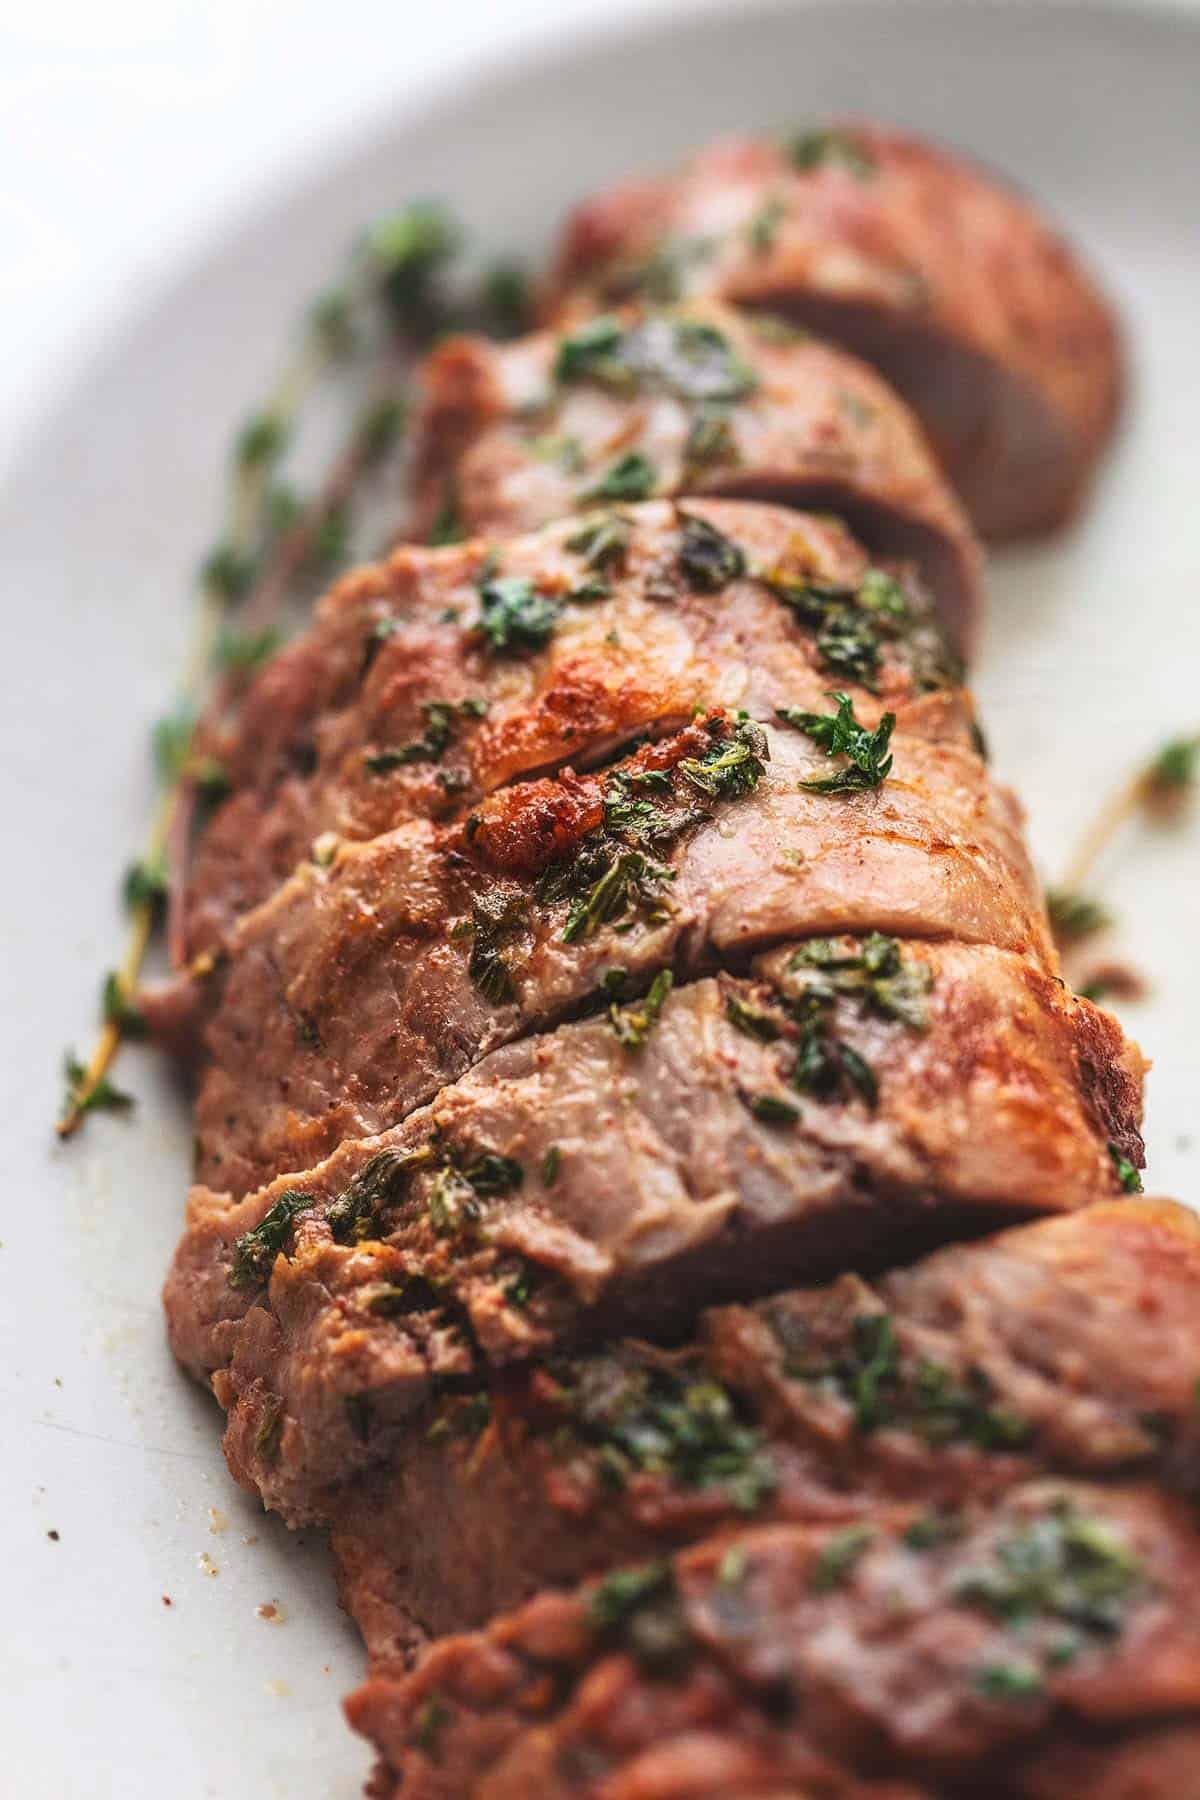 close up ofgarlic butter roasted pork tenderloin with herbs on top.